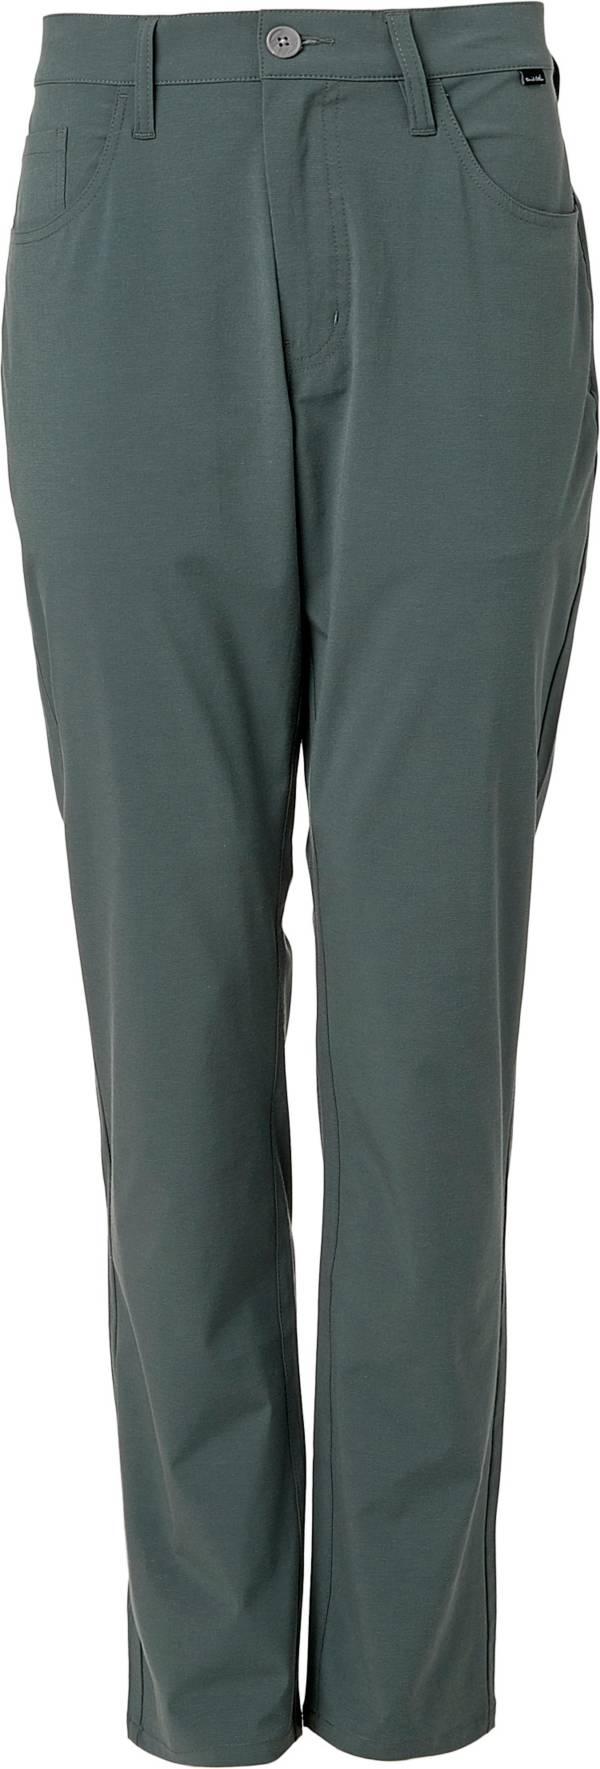 TravisMathew Men's Slack Golf Pants product image